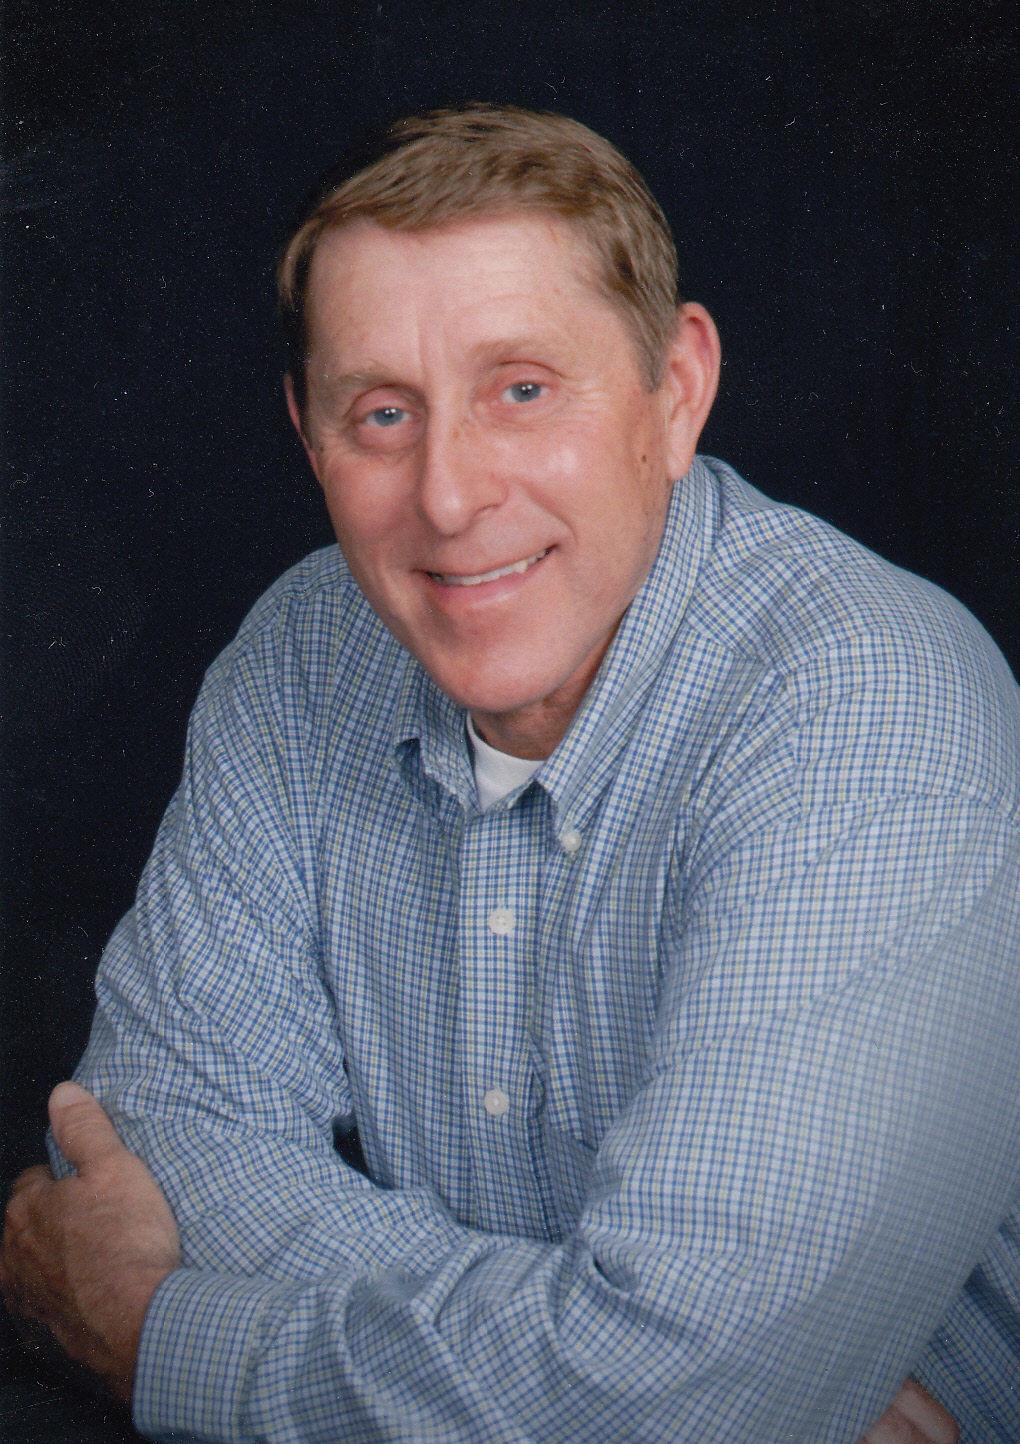 Robert Lee Gilman